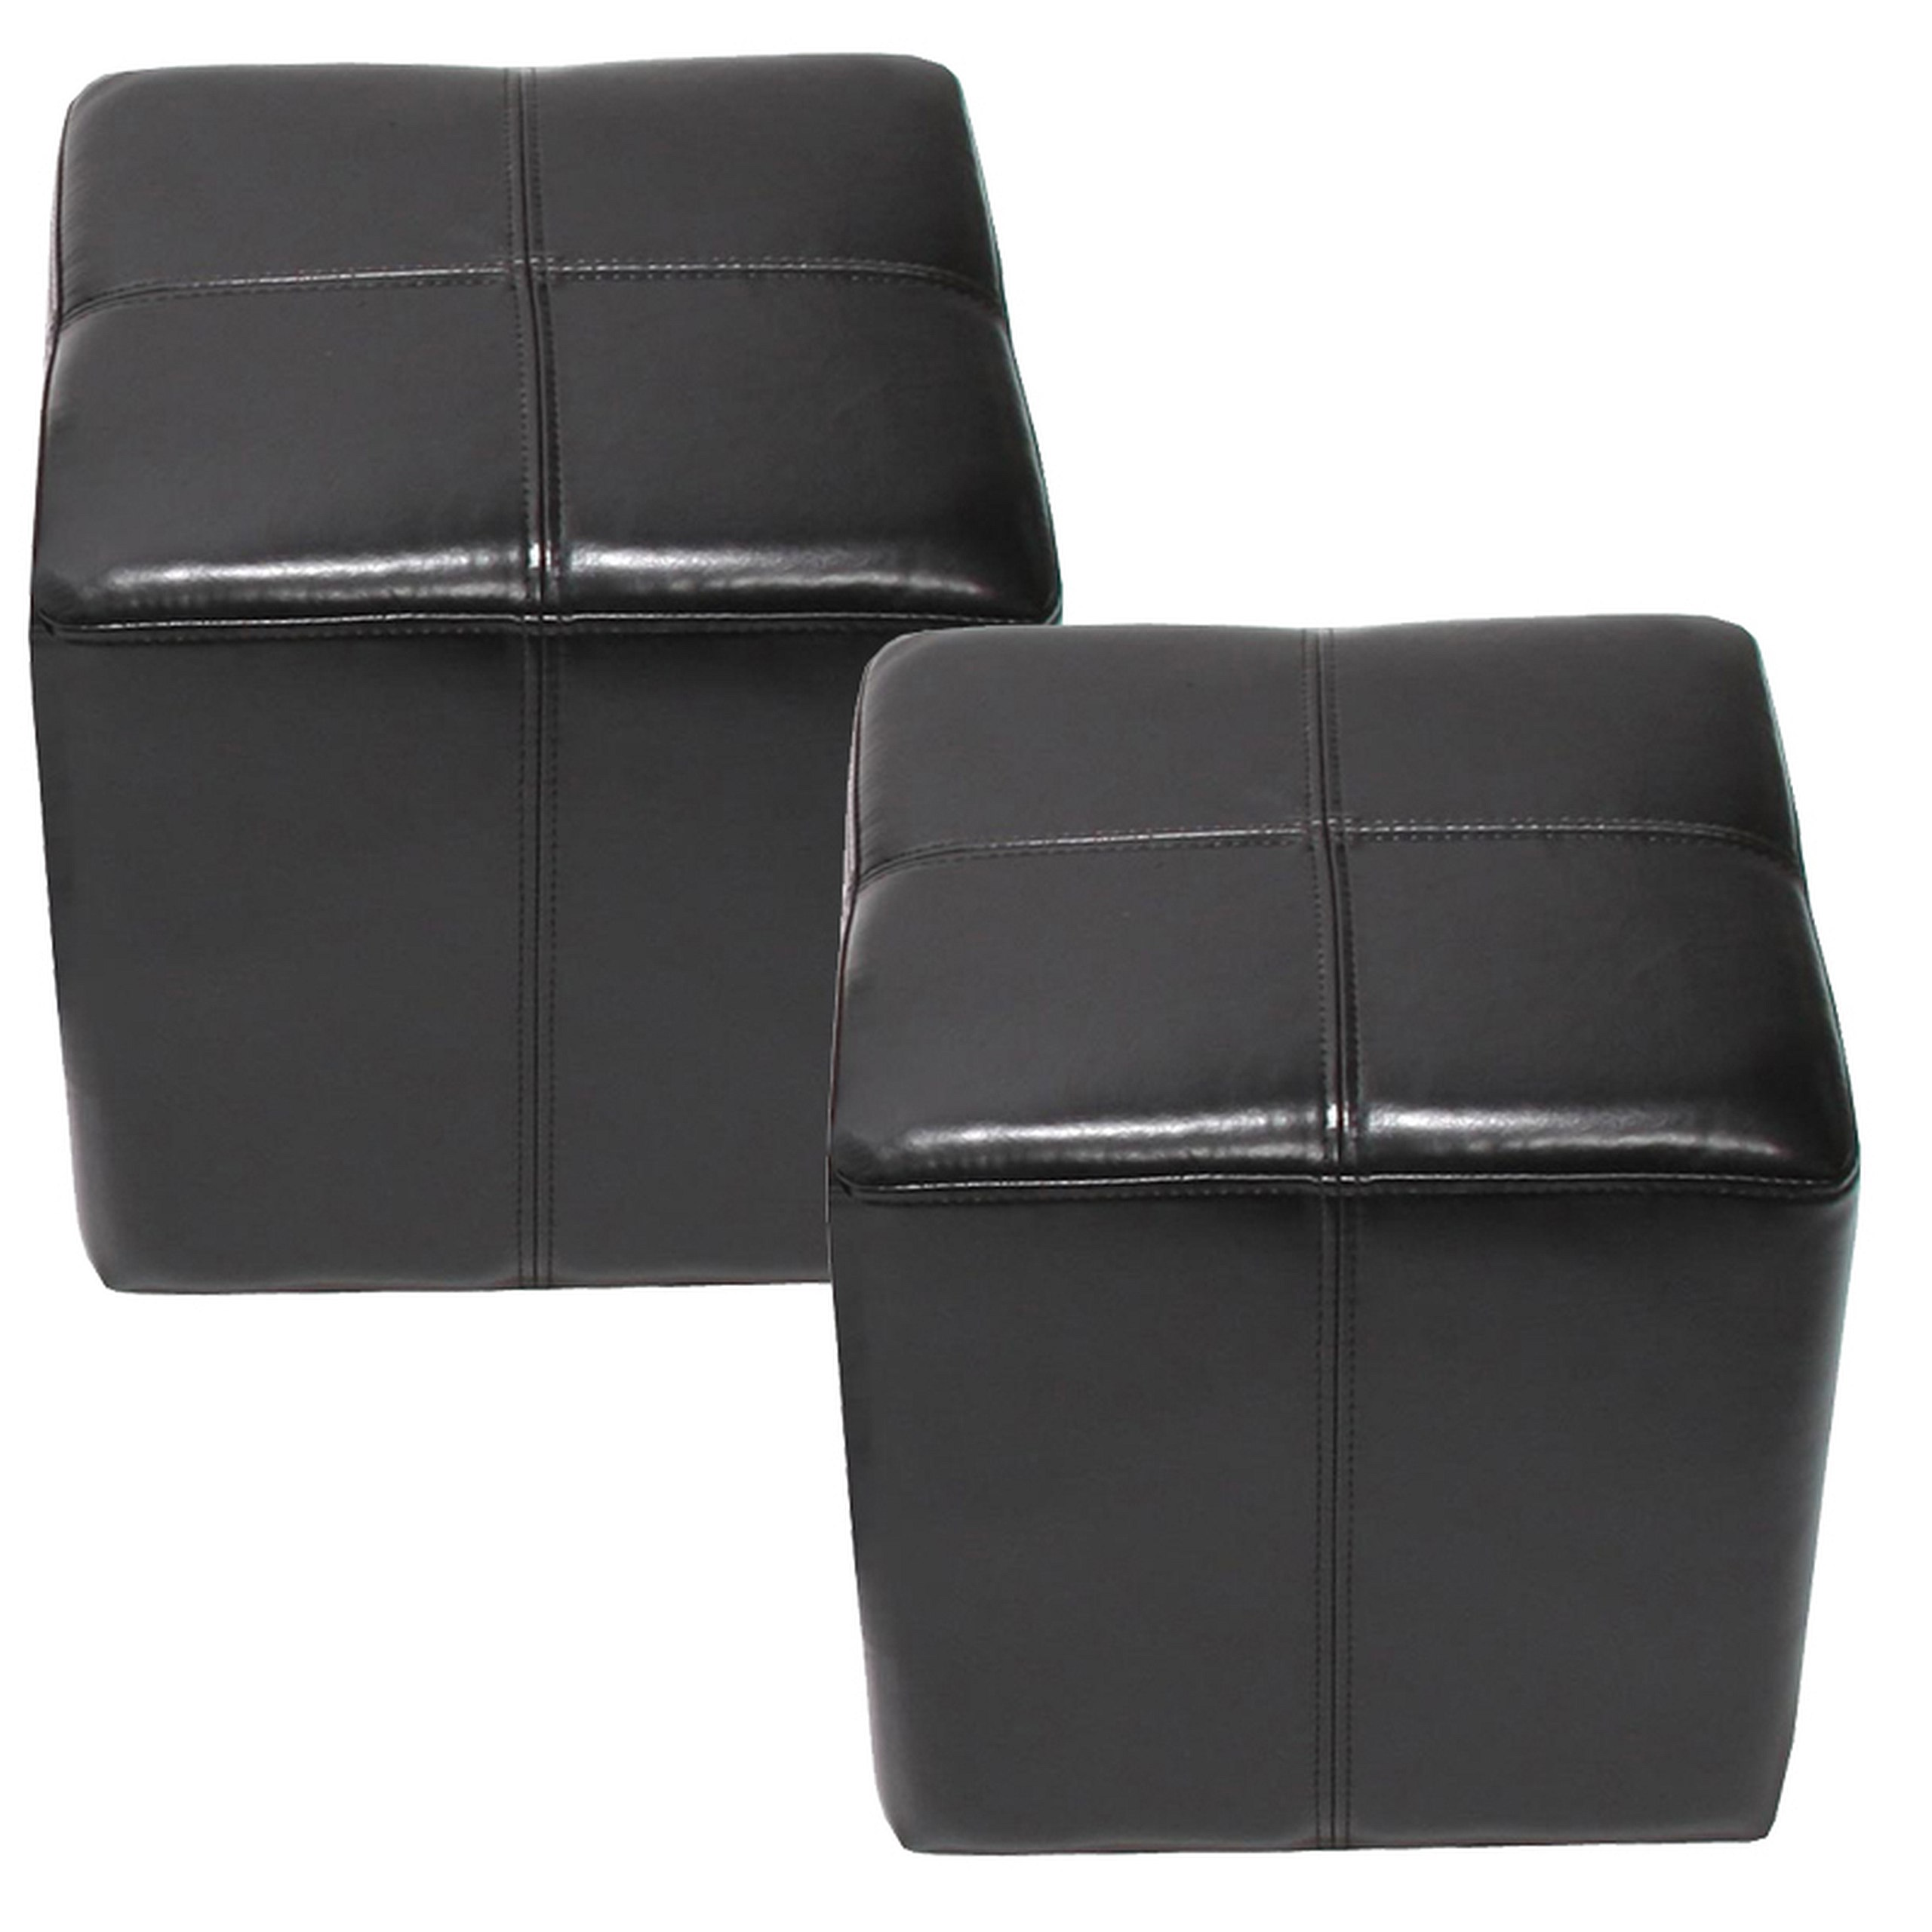 2x sitzw rfel hocker sitzhocker onex leder 36x36x36cm schwarz. Black Bedroom Furniture Sets. Home Design Ideas